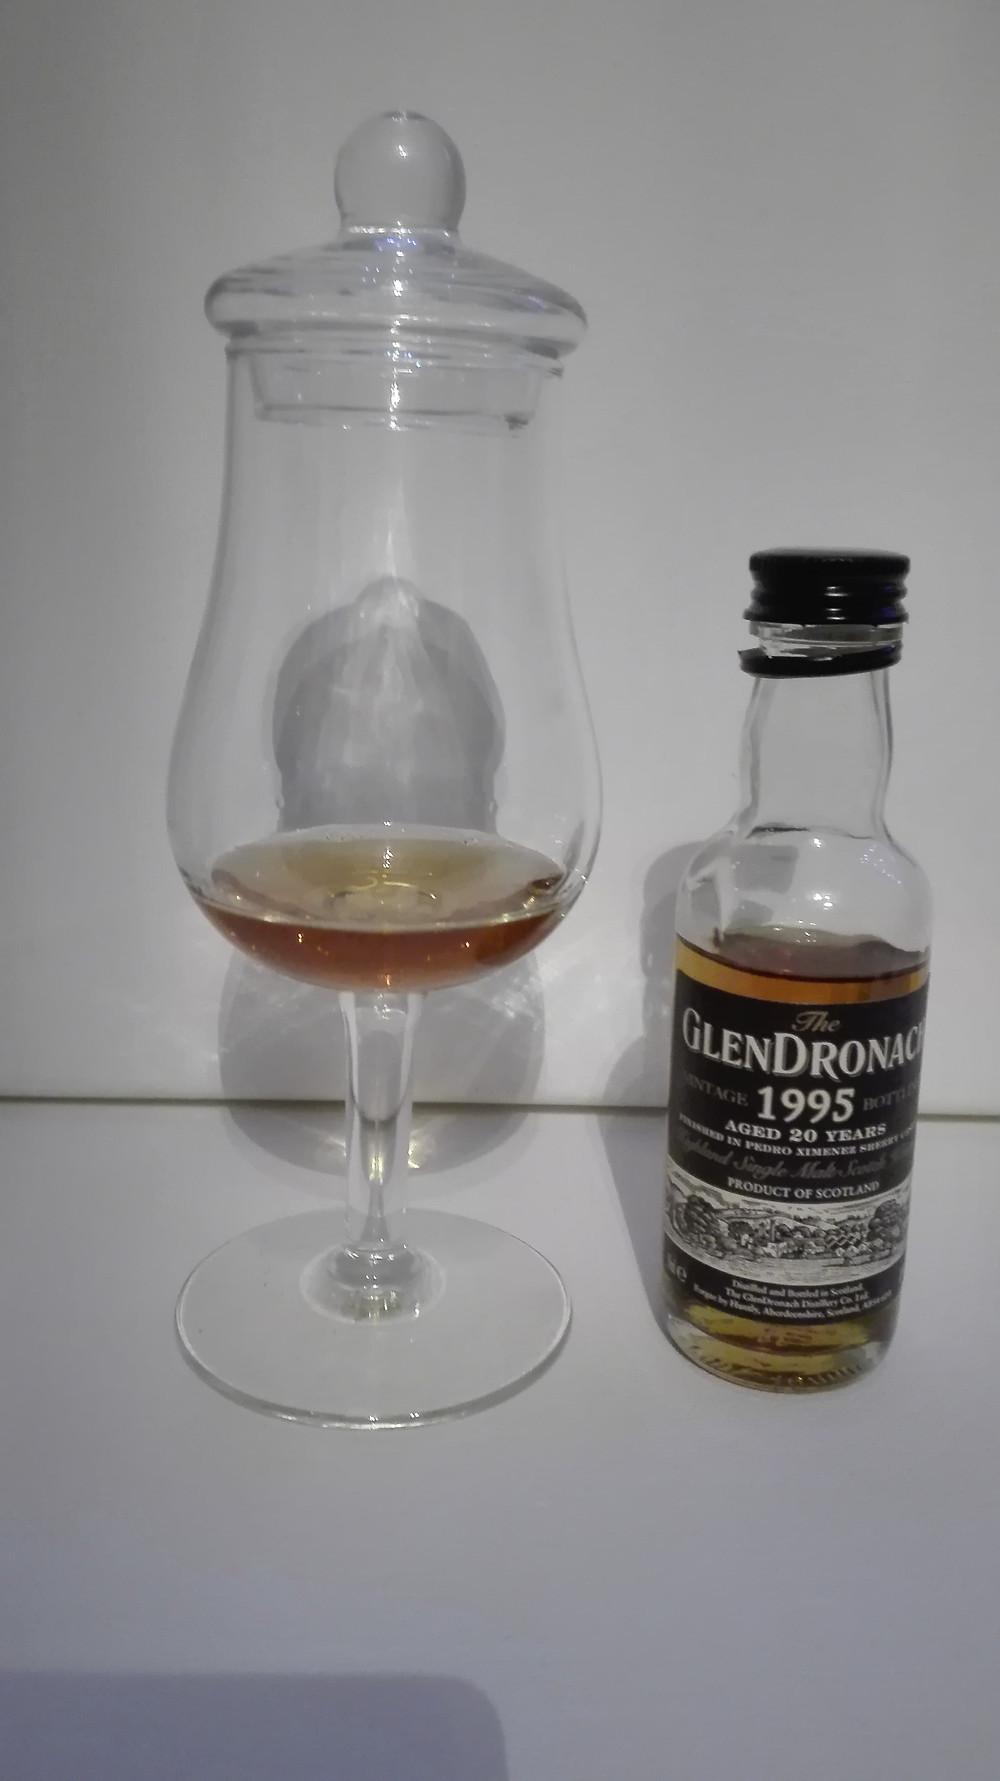 Glendronach Parliament, Glendronach, Tasting, Test, Parliament, Glendronach 21, Glendronach 1995